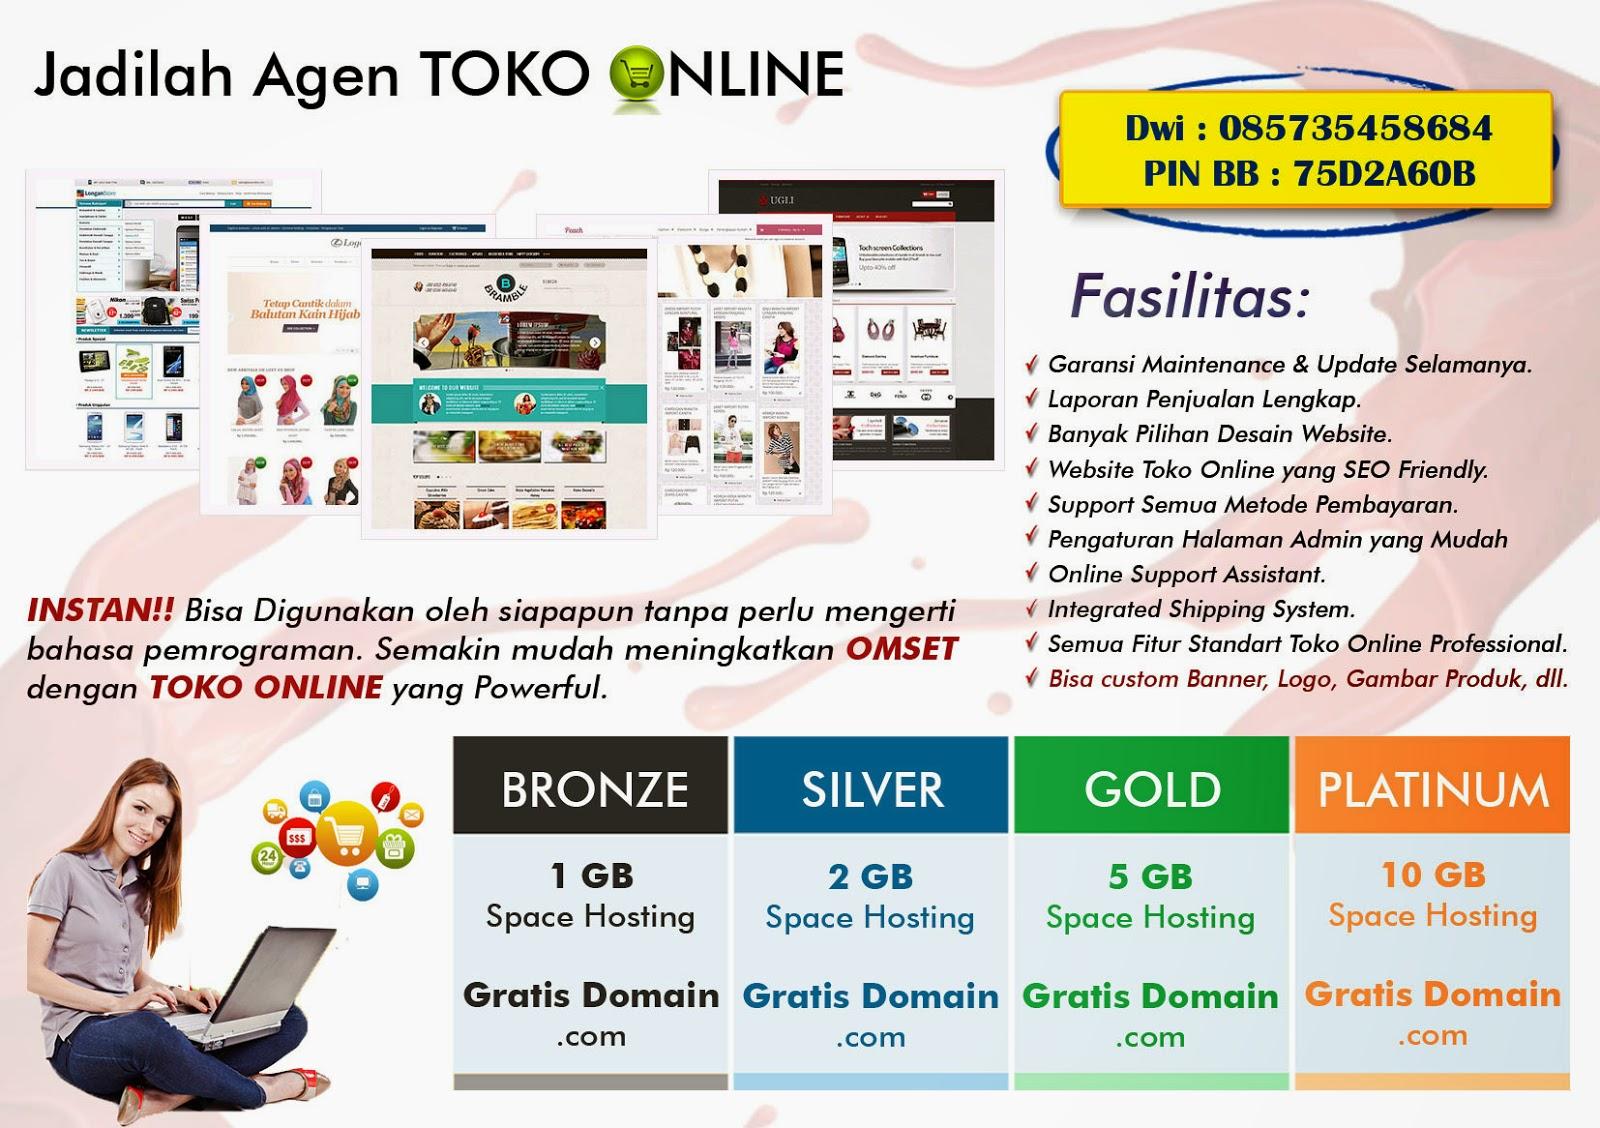 www.tekanini.com/duuymut